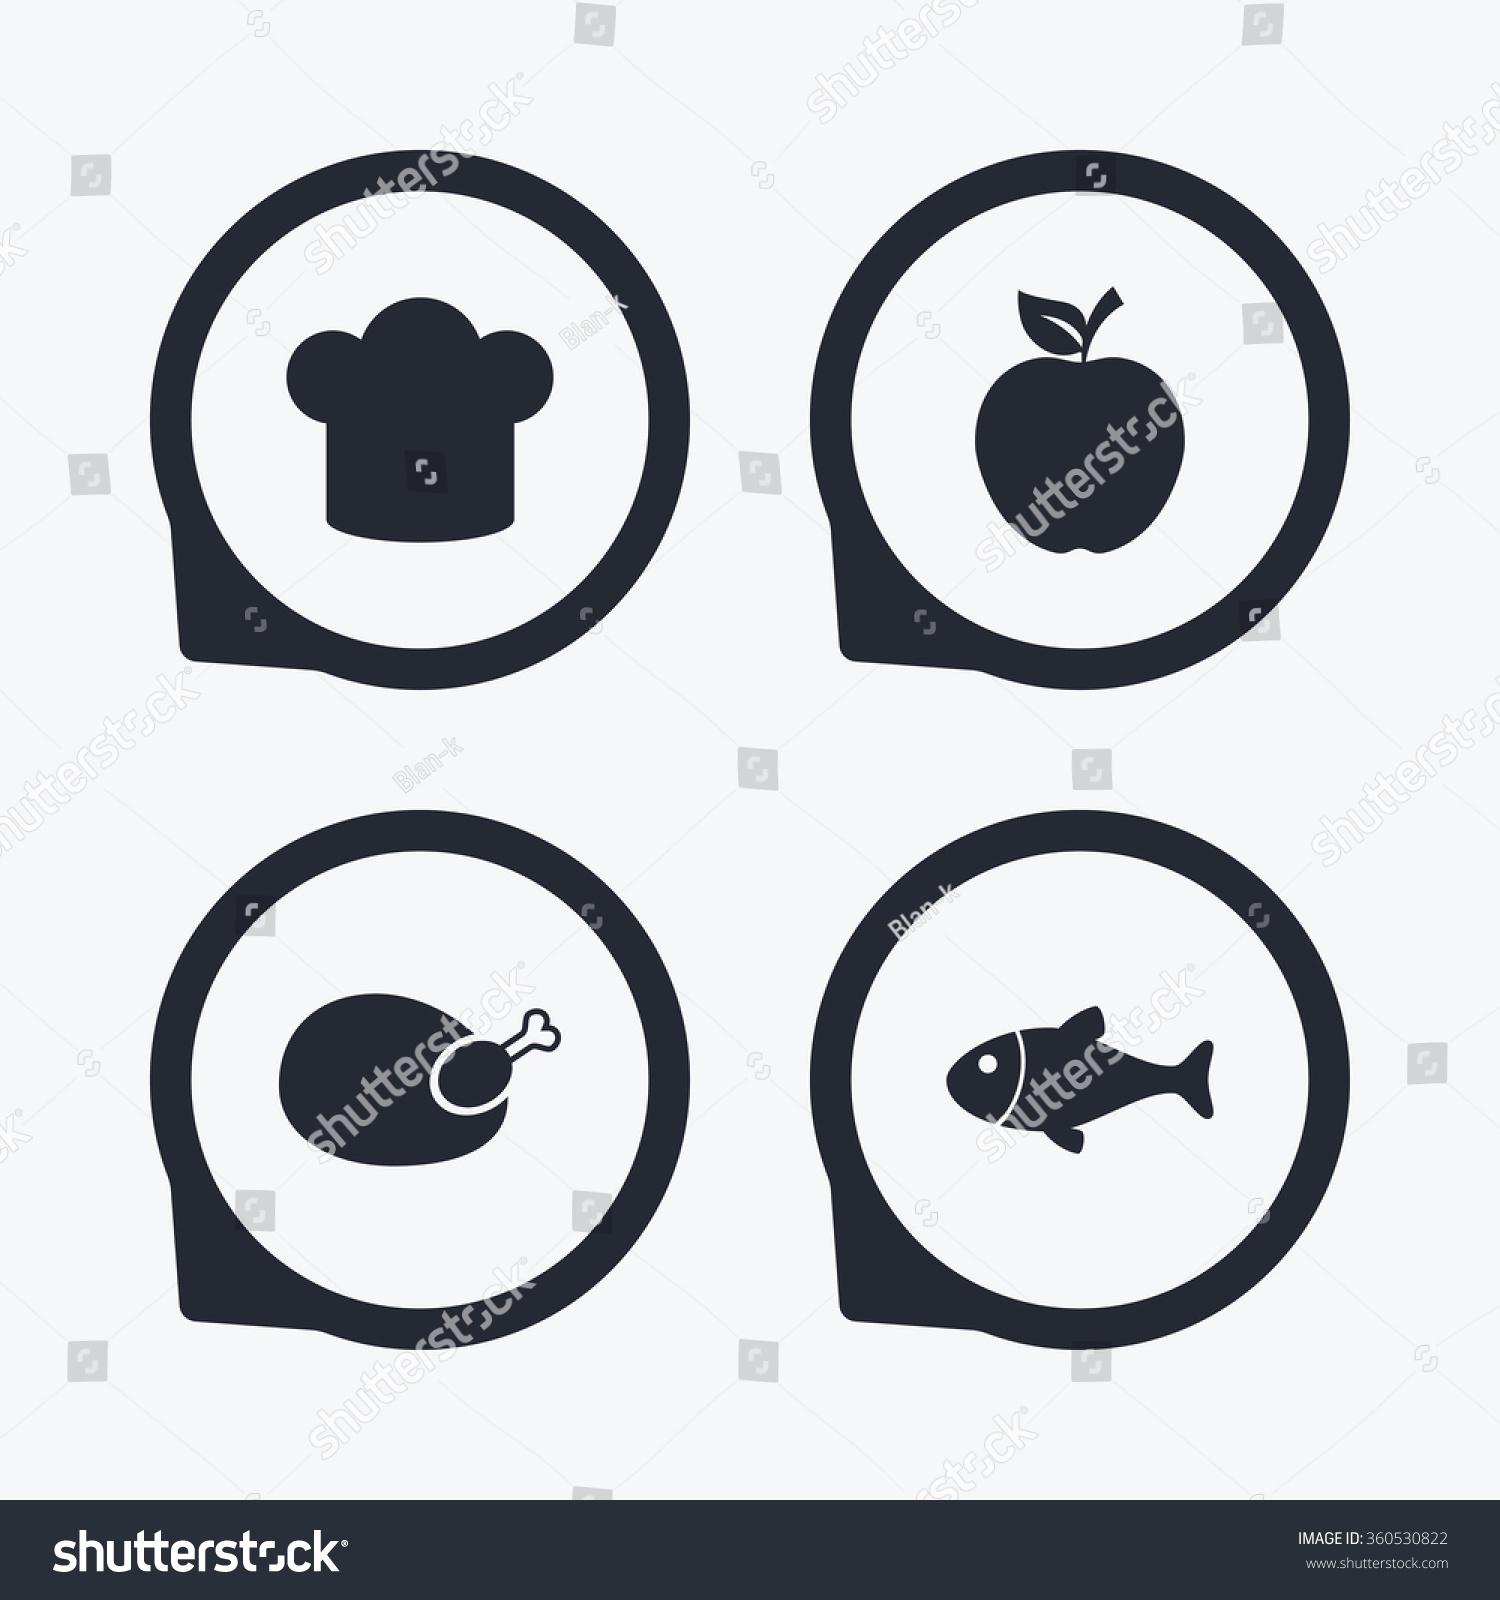 Food icons apple fruit leaf symbol stock illustration 360530822 apple fruit with leaf symbol chicken hen bird meat sign fish buycottarizona